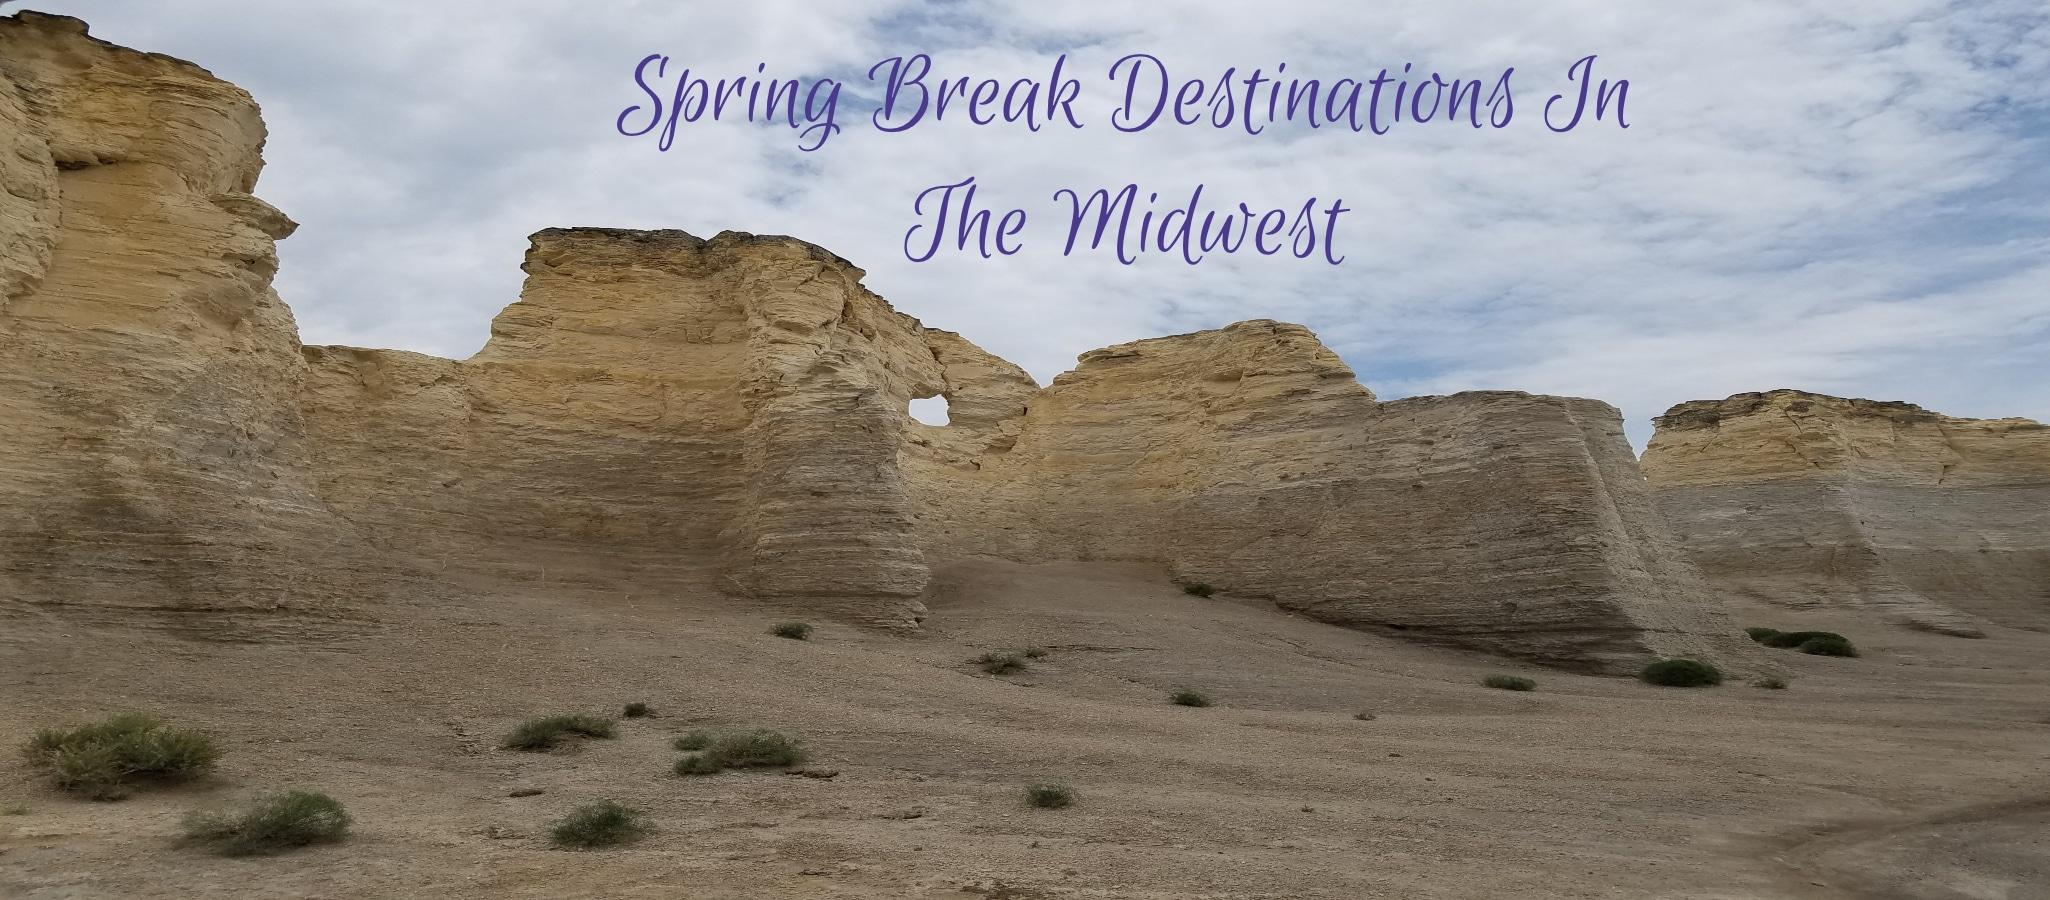 Spring Break Midwest Destinations